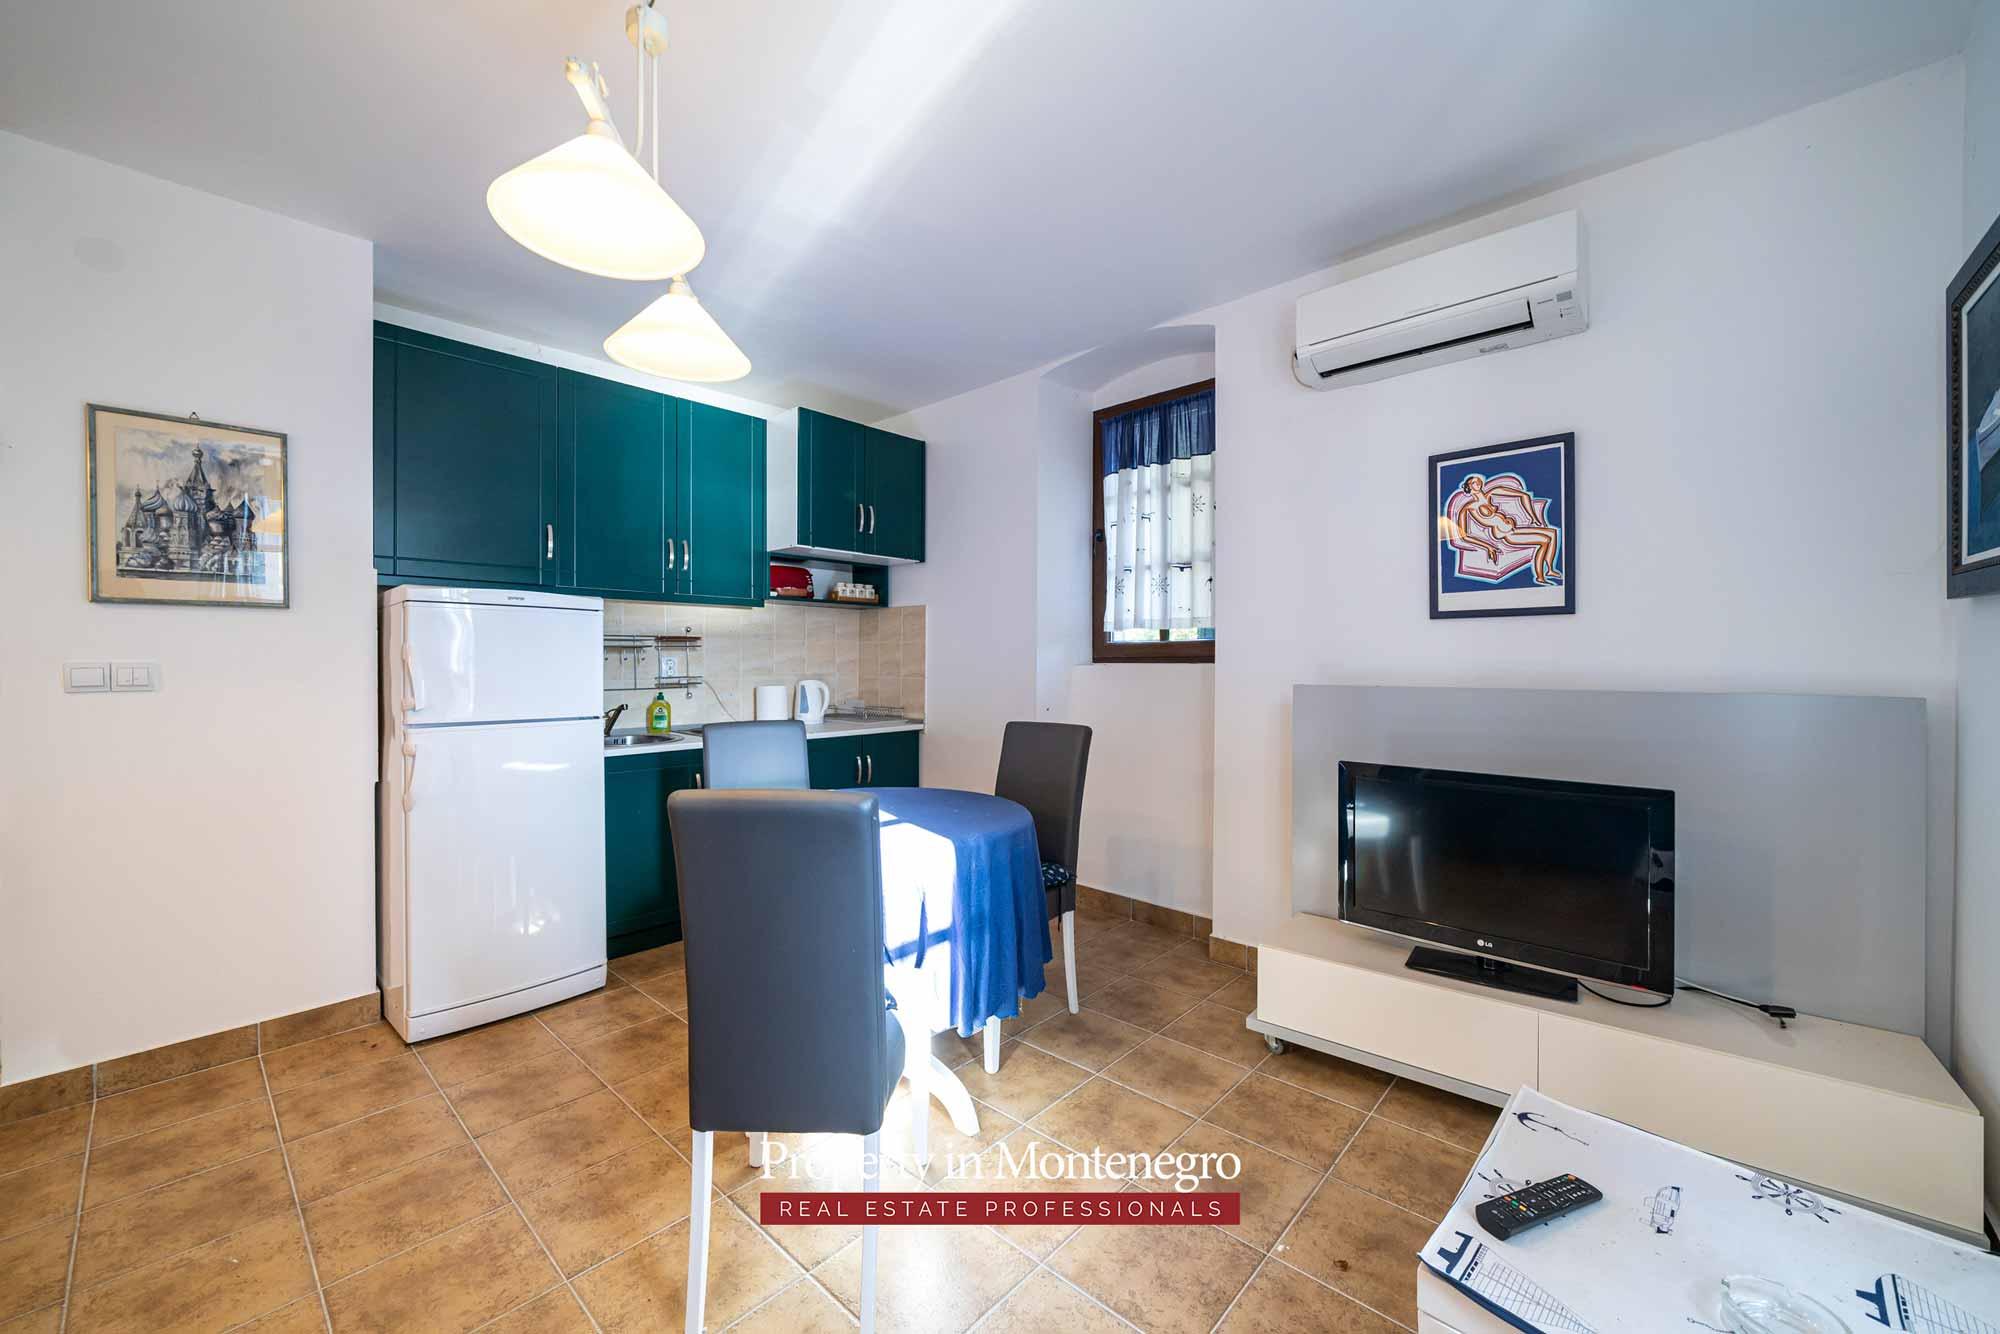 Studio apartment for sale in Bay of Kotor